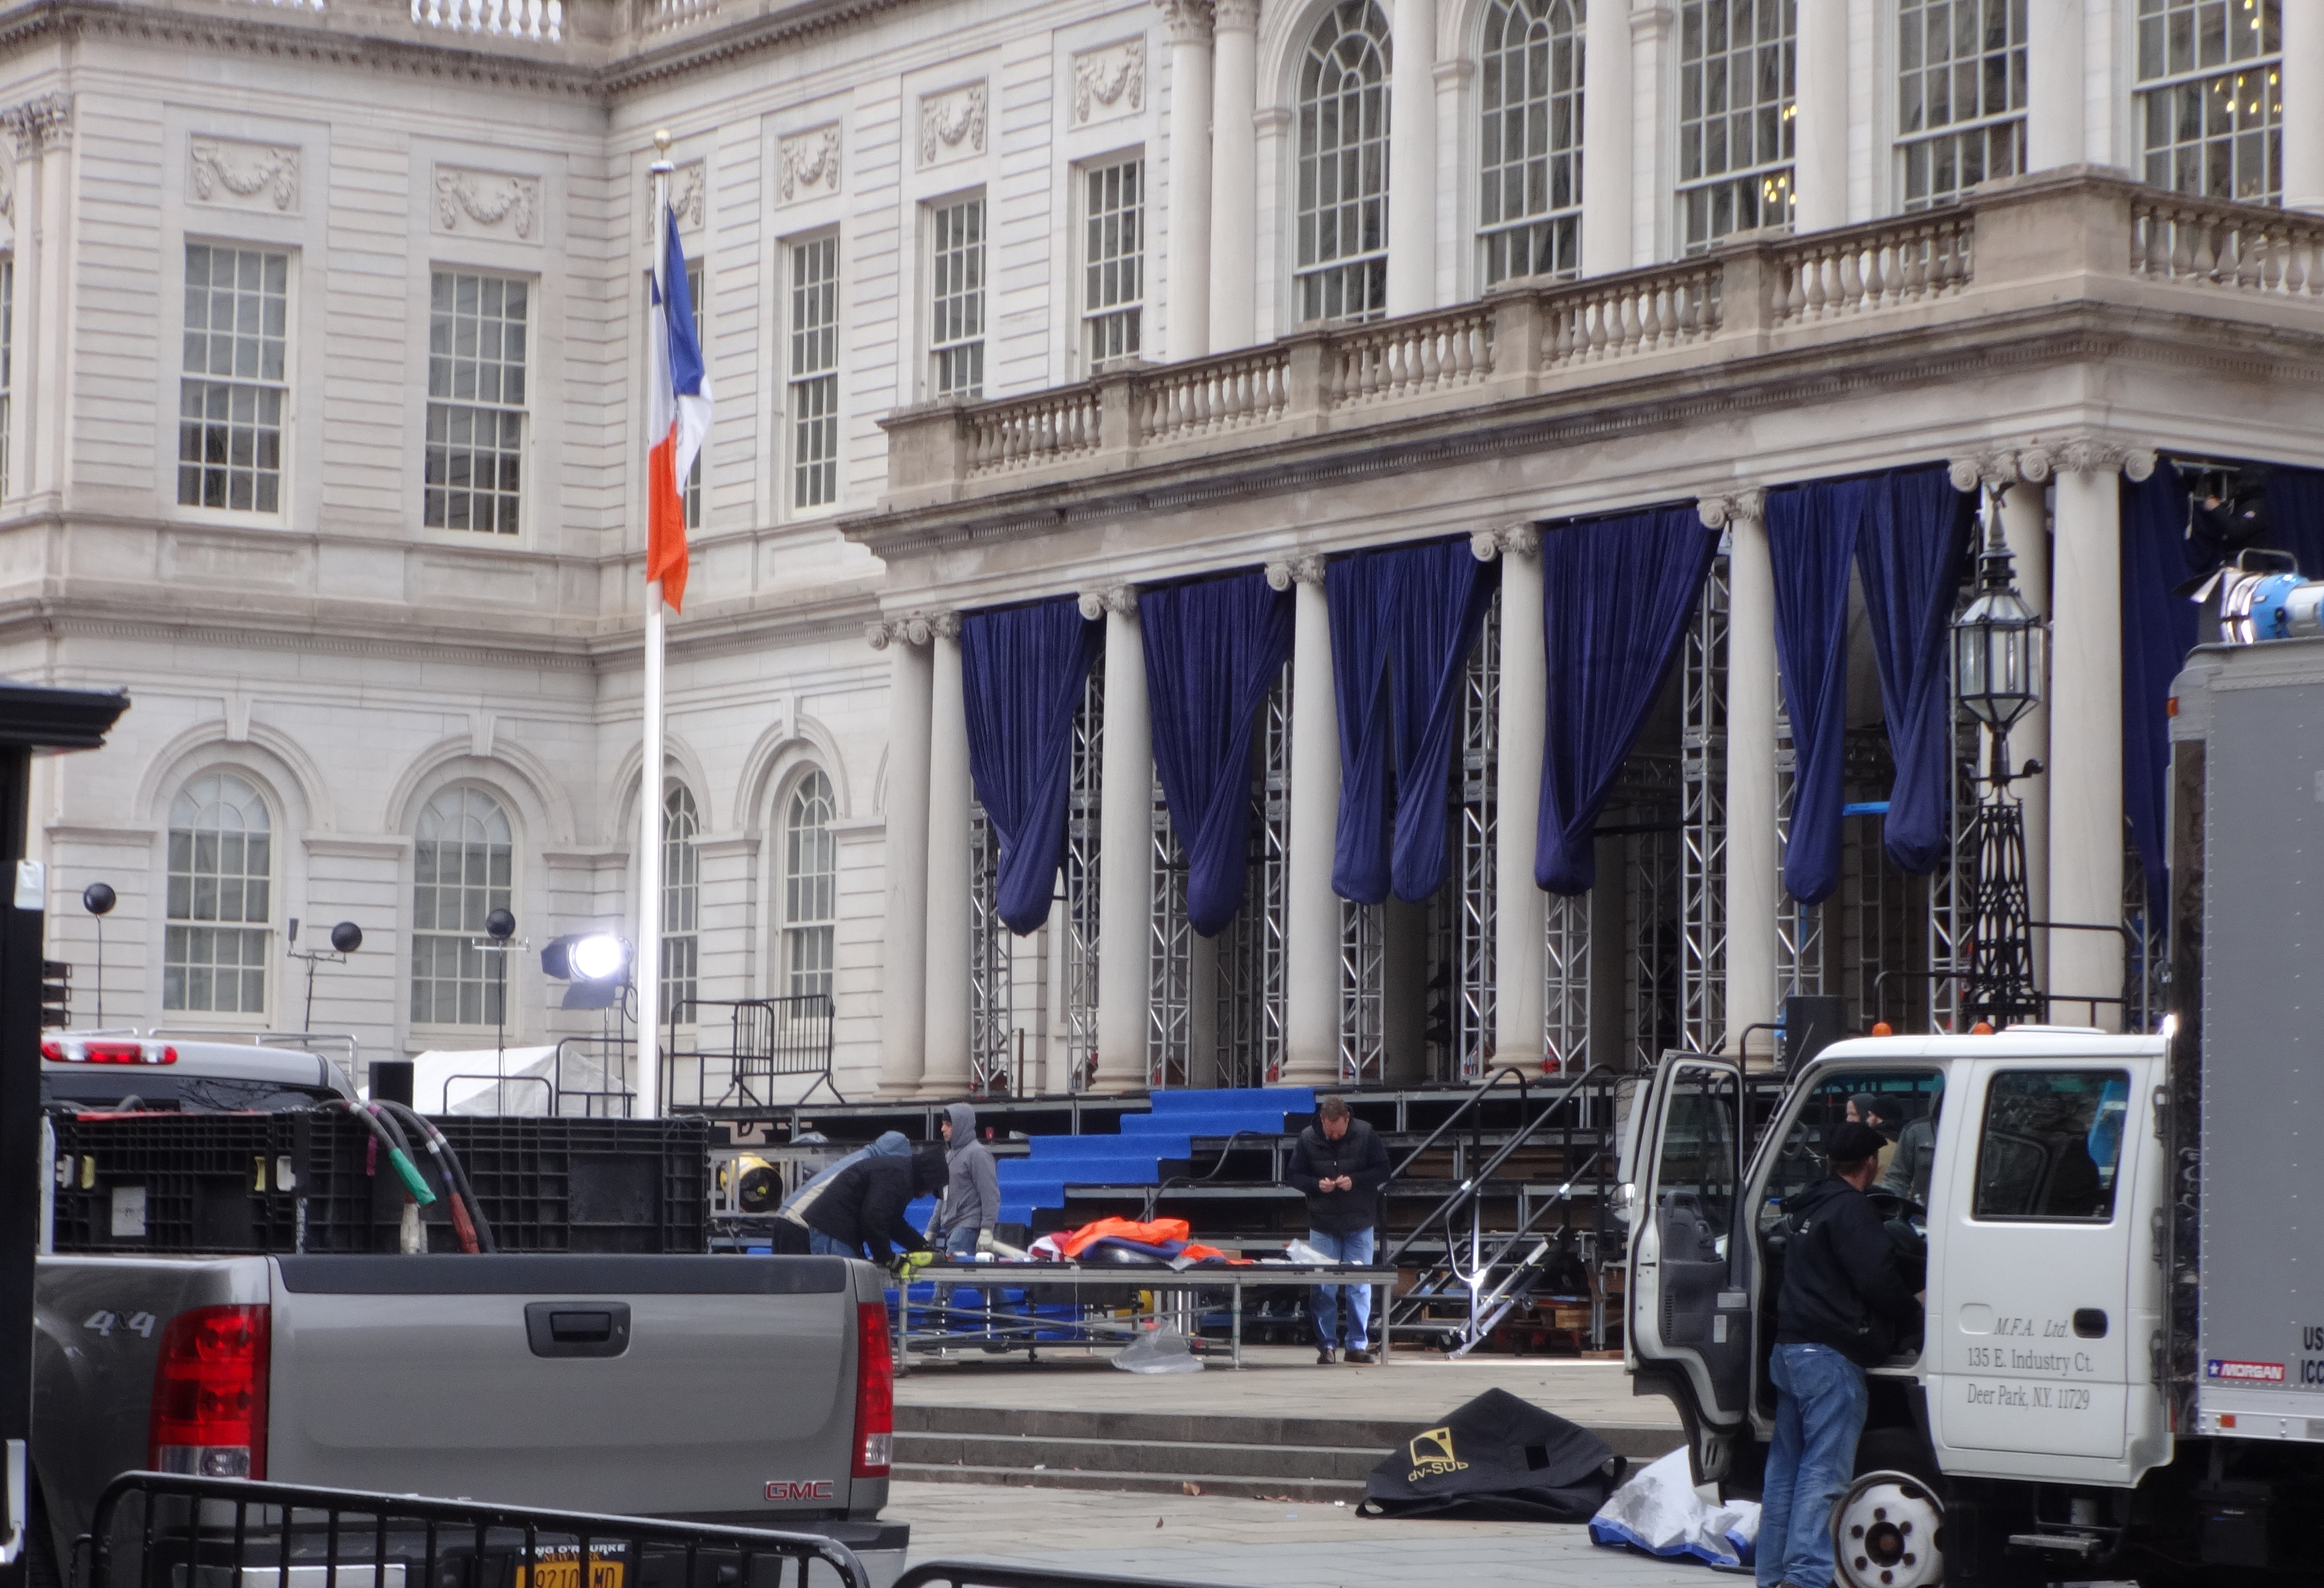 inauguration setup 12-30-2013